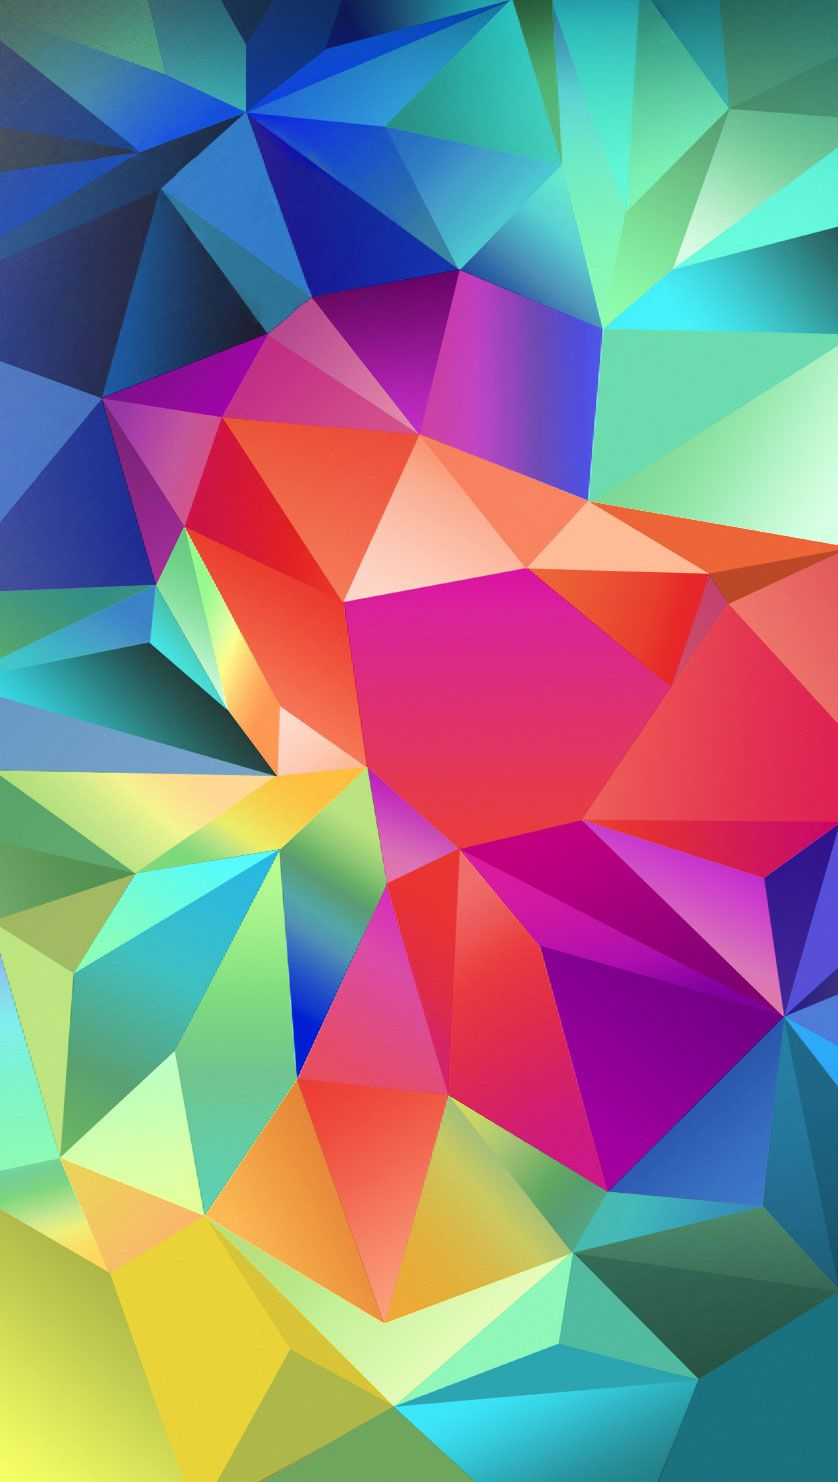 10 Of Unique S5 Wallpaper 2k S5 Wallpaper Iphone Wallpaper Android Wallpaper